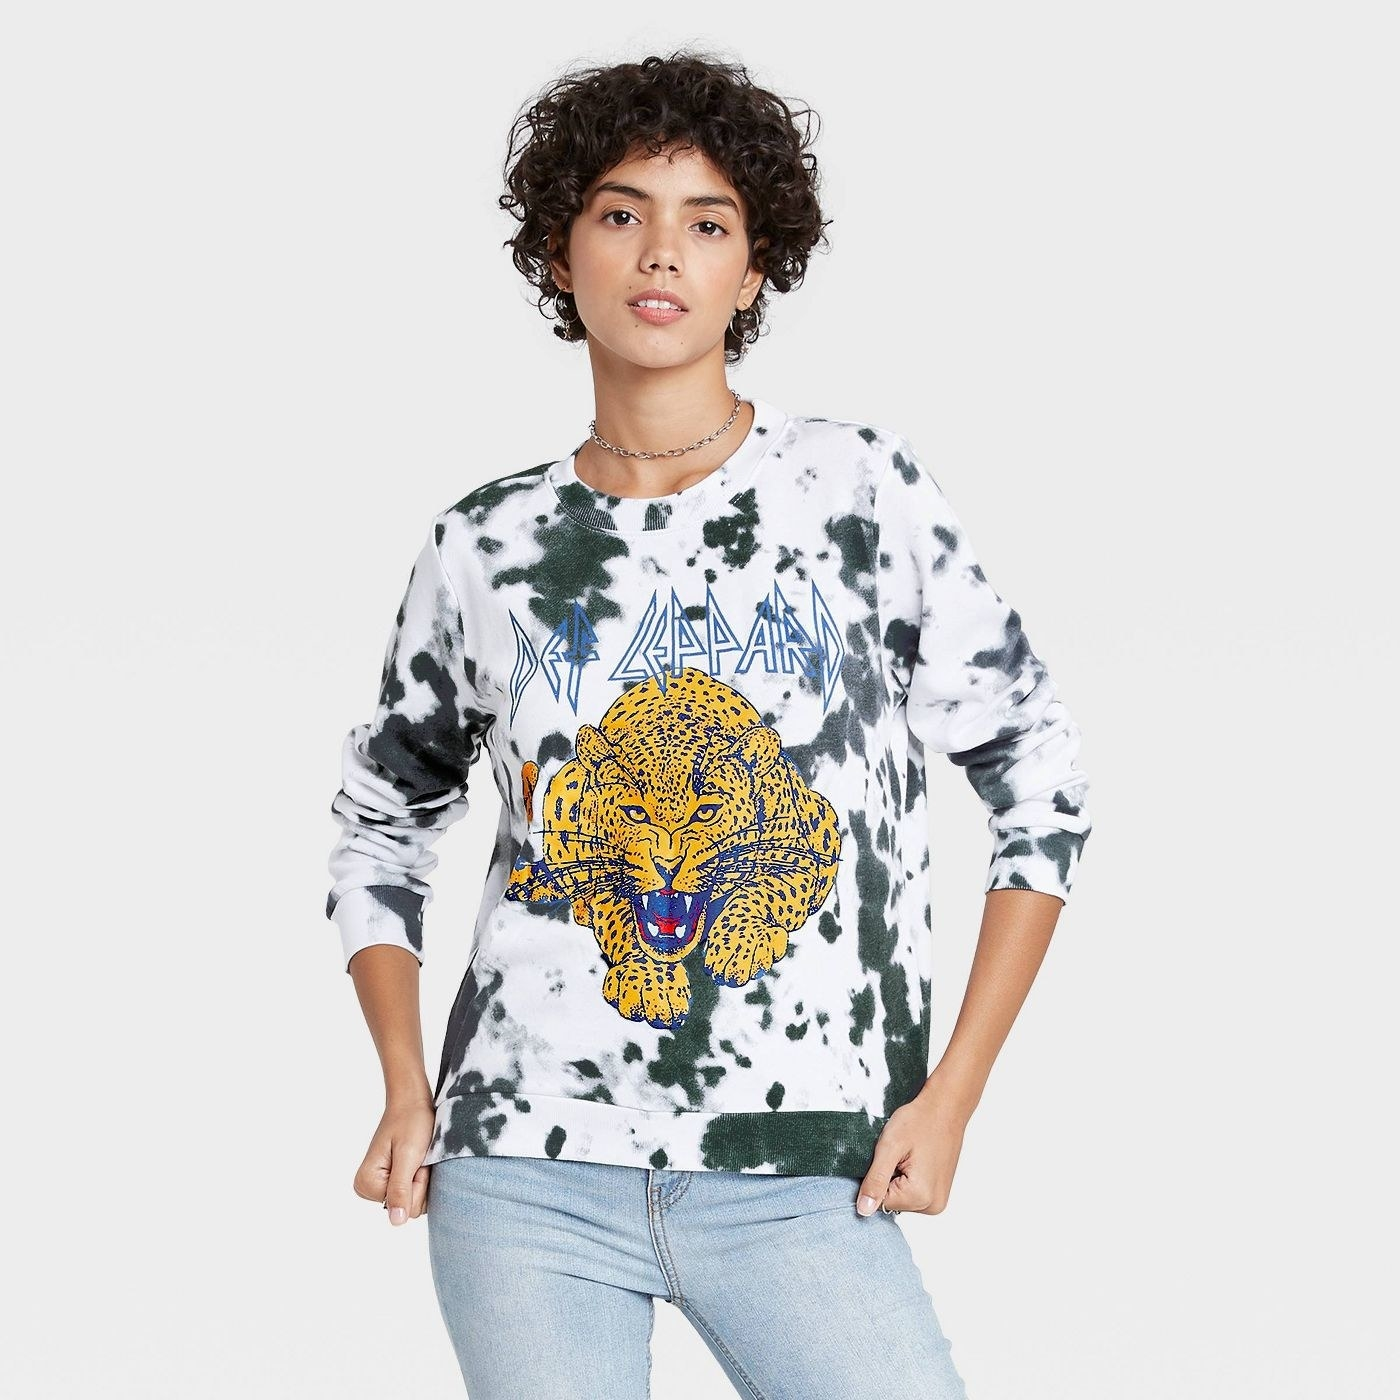 Model in Def Leppard graphic sweatshirt